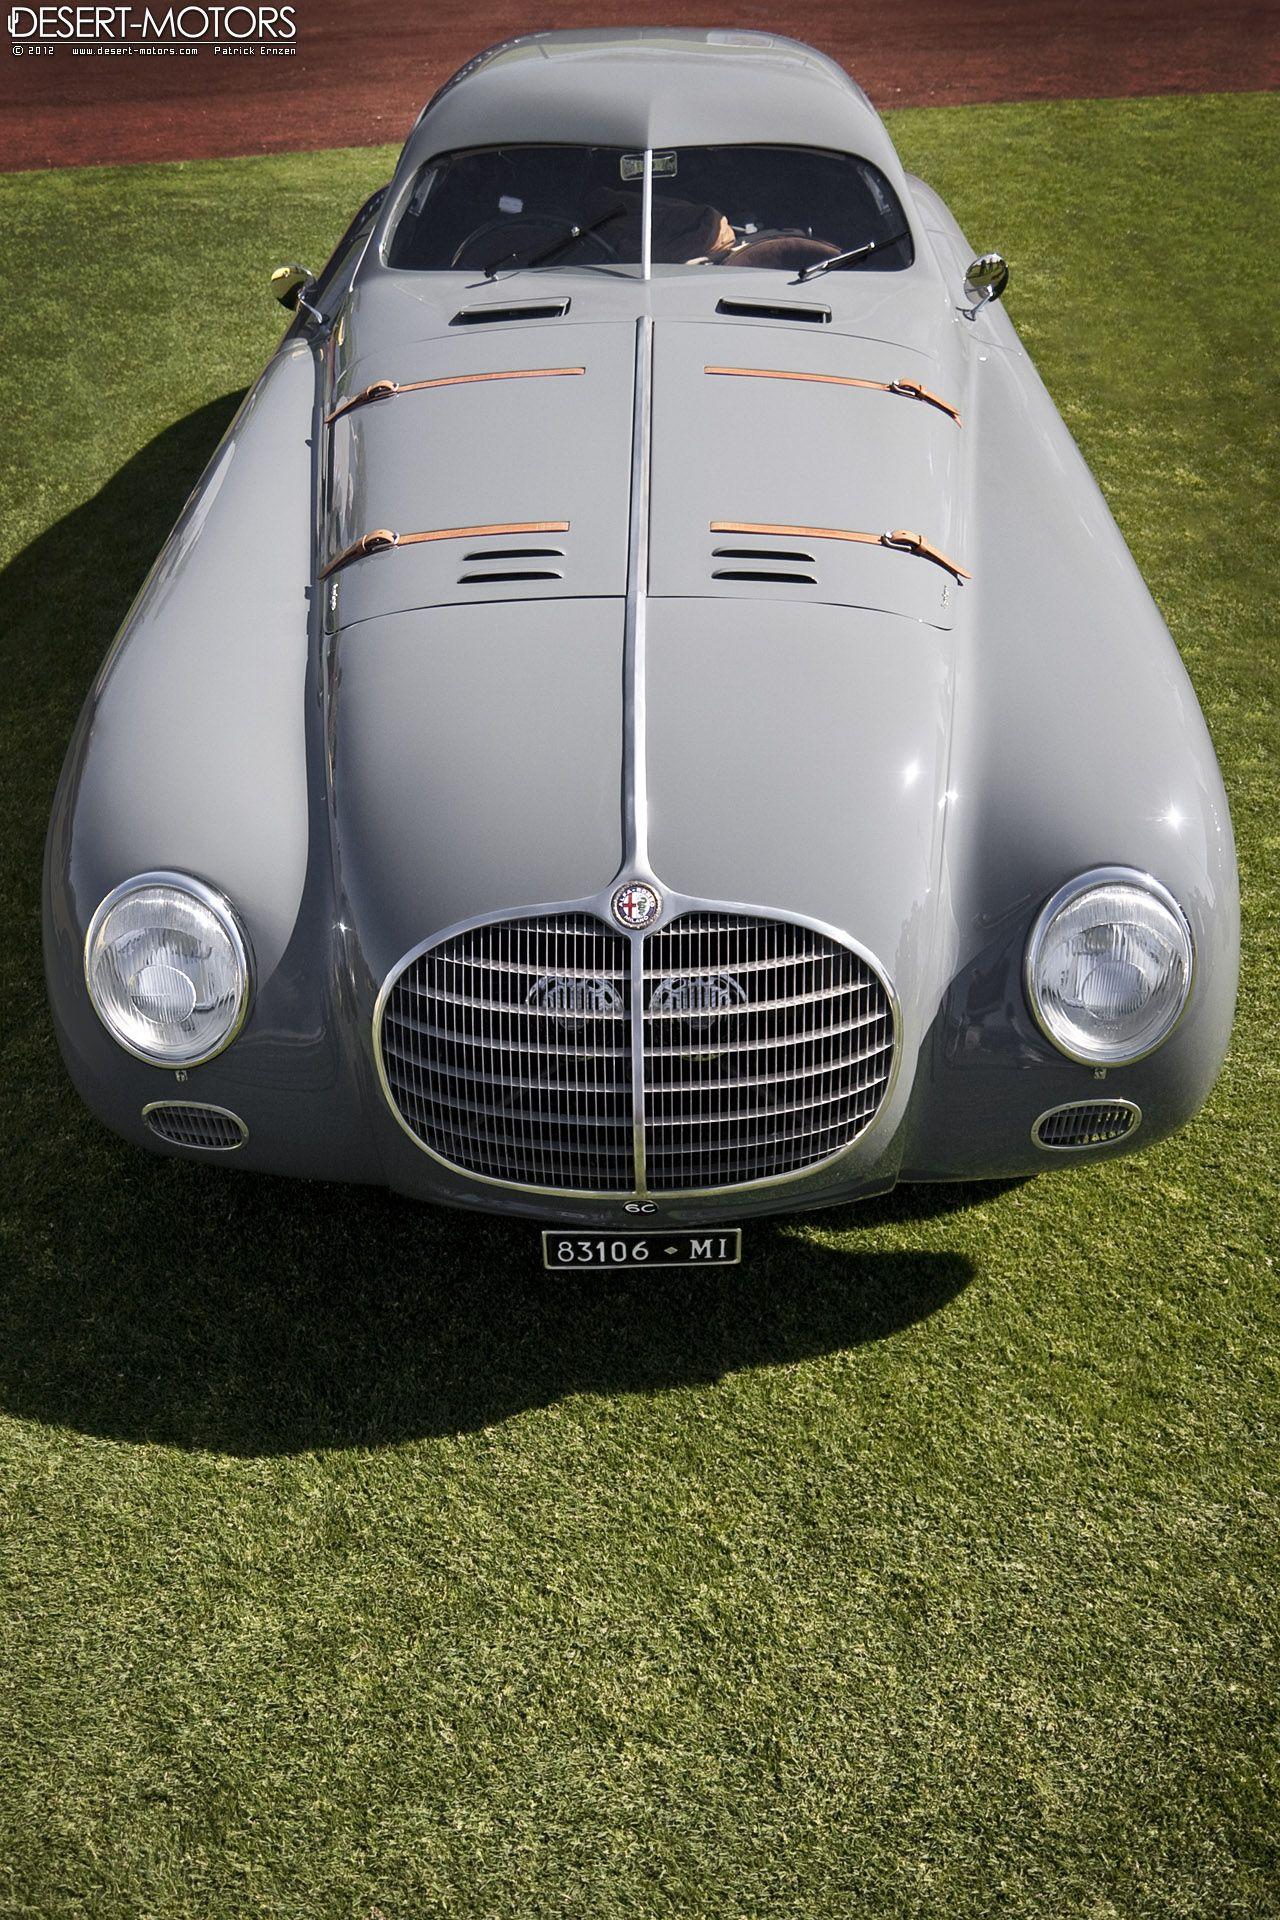 1942 Alfa Romeo 6C 2500 SS Berlinetta Aerodinamica